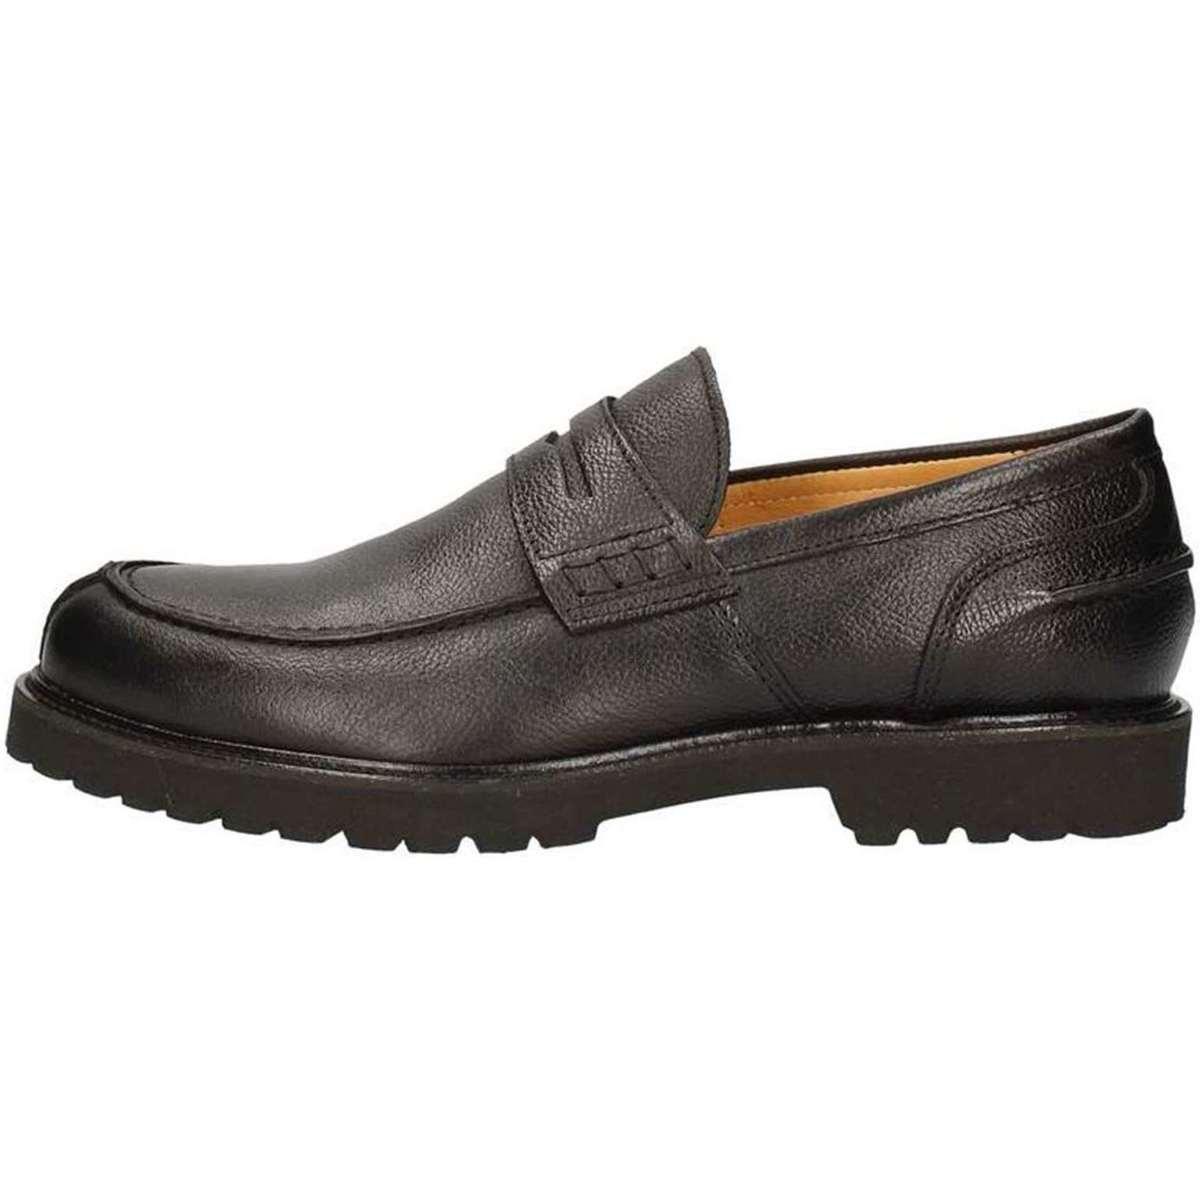 Hudson 314 Mokassin Mann Schwarz Schwarz - Schuhe Slipper Herren 84,20 €